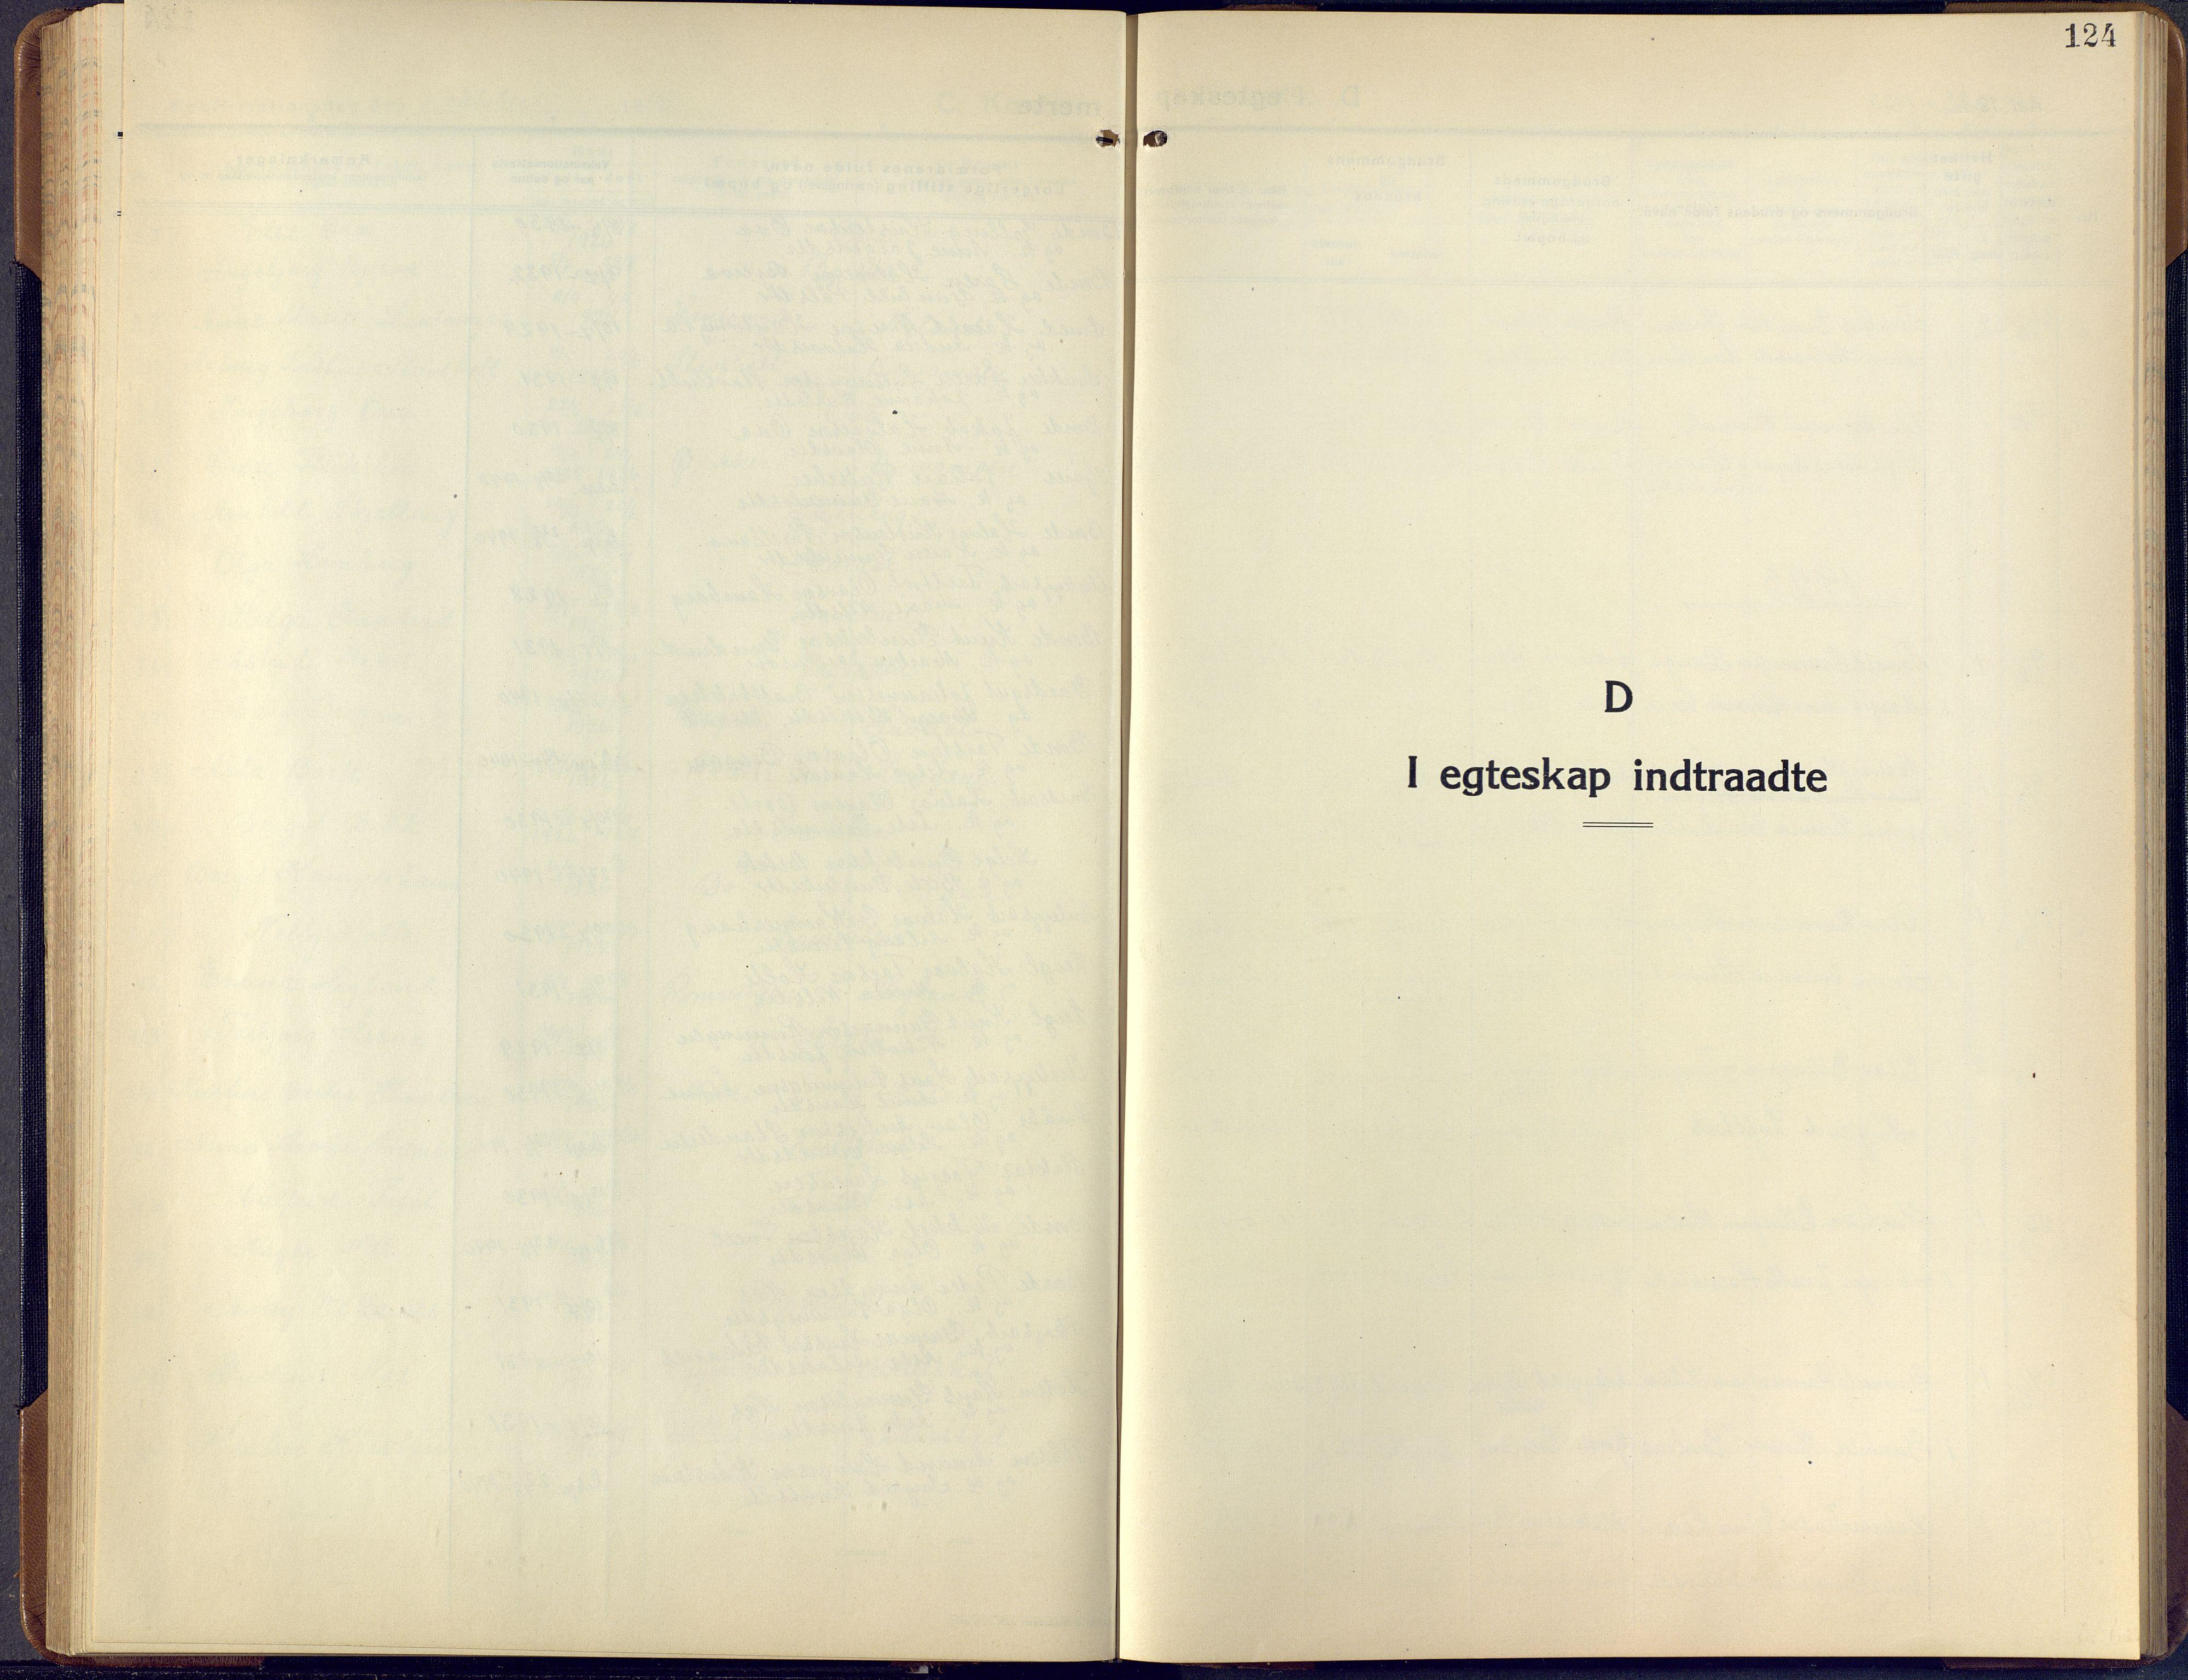 SAKO, Lunde kirkebøker, F/Fa/L0006: Ministerialbok nr. I 6, 1922-1940, s. 124